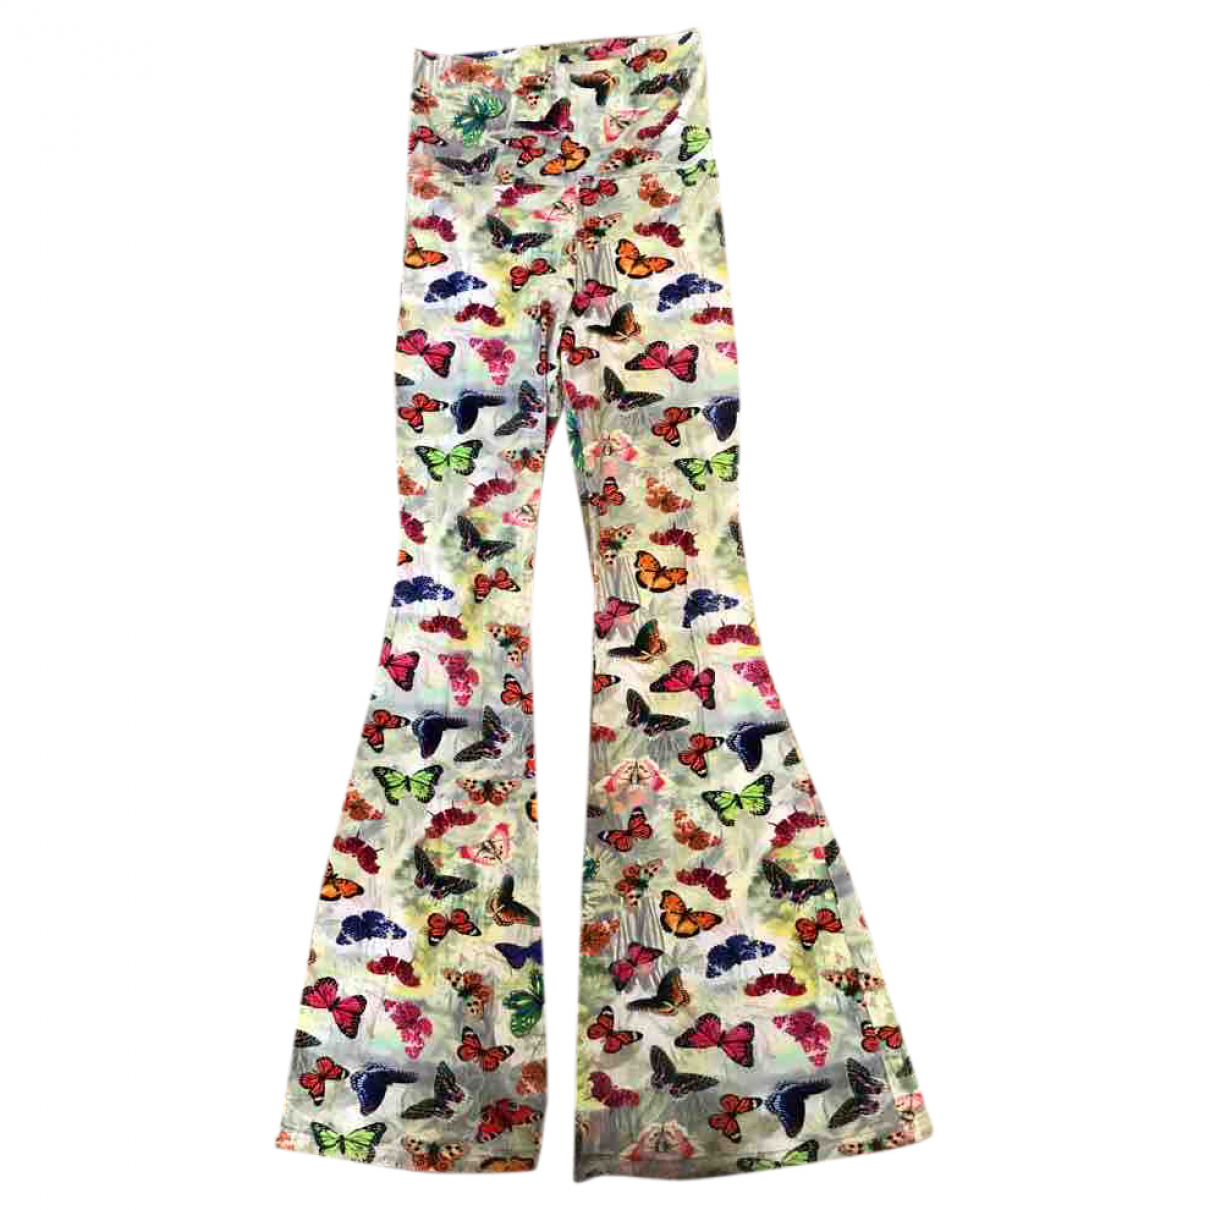 Cestlav \N Trousers for Women S International